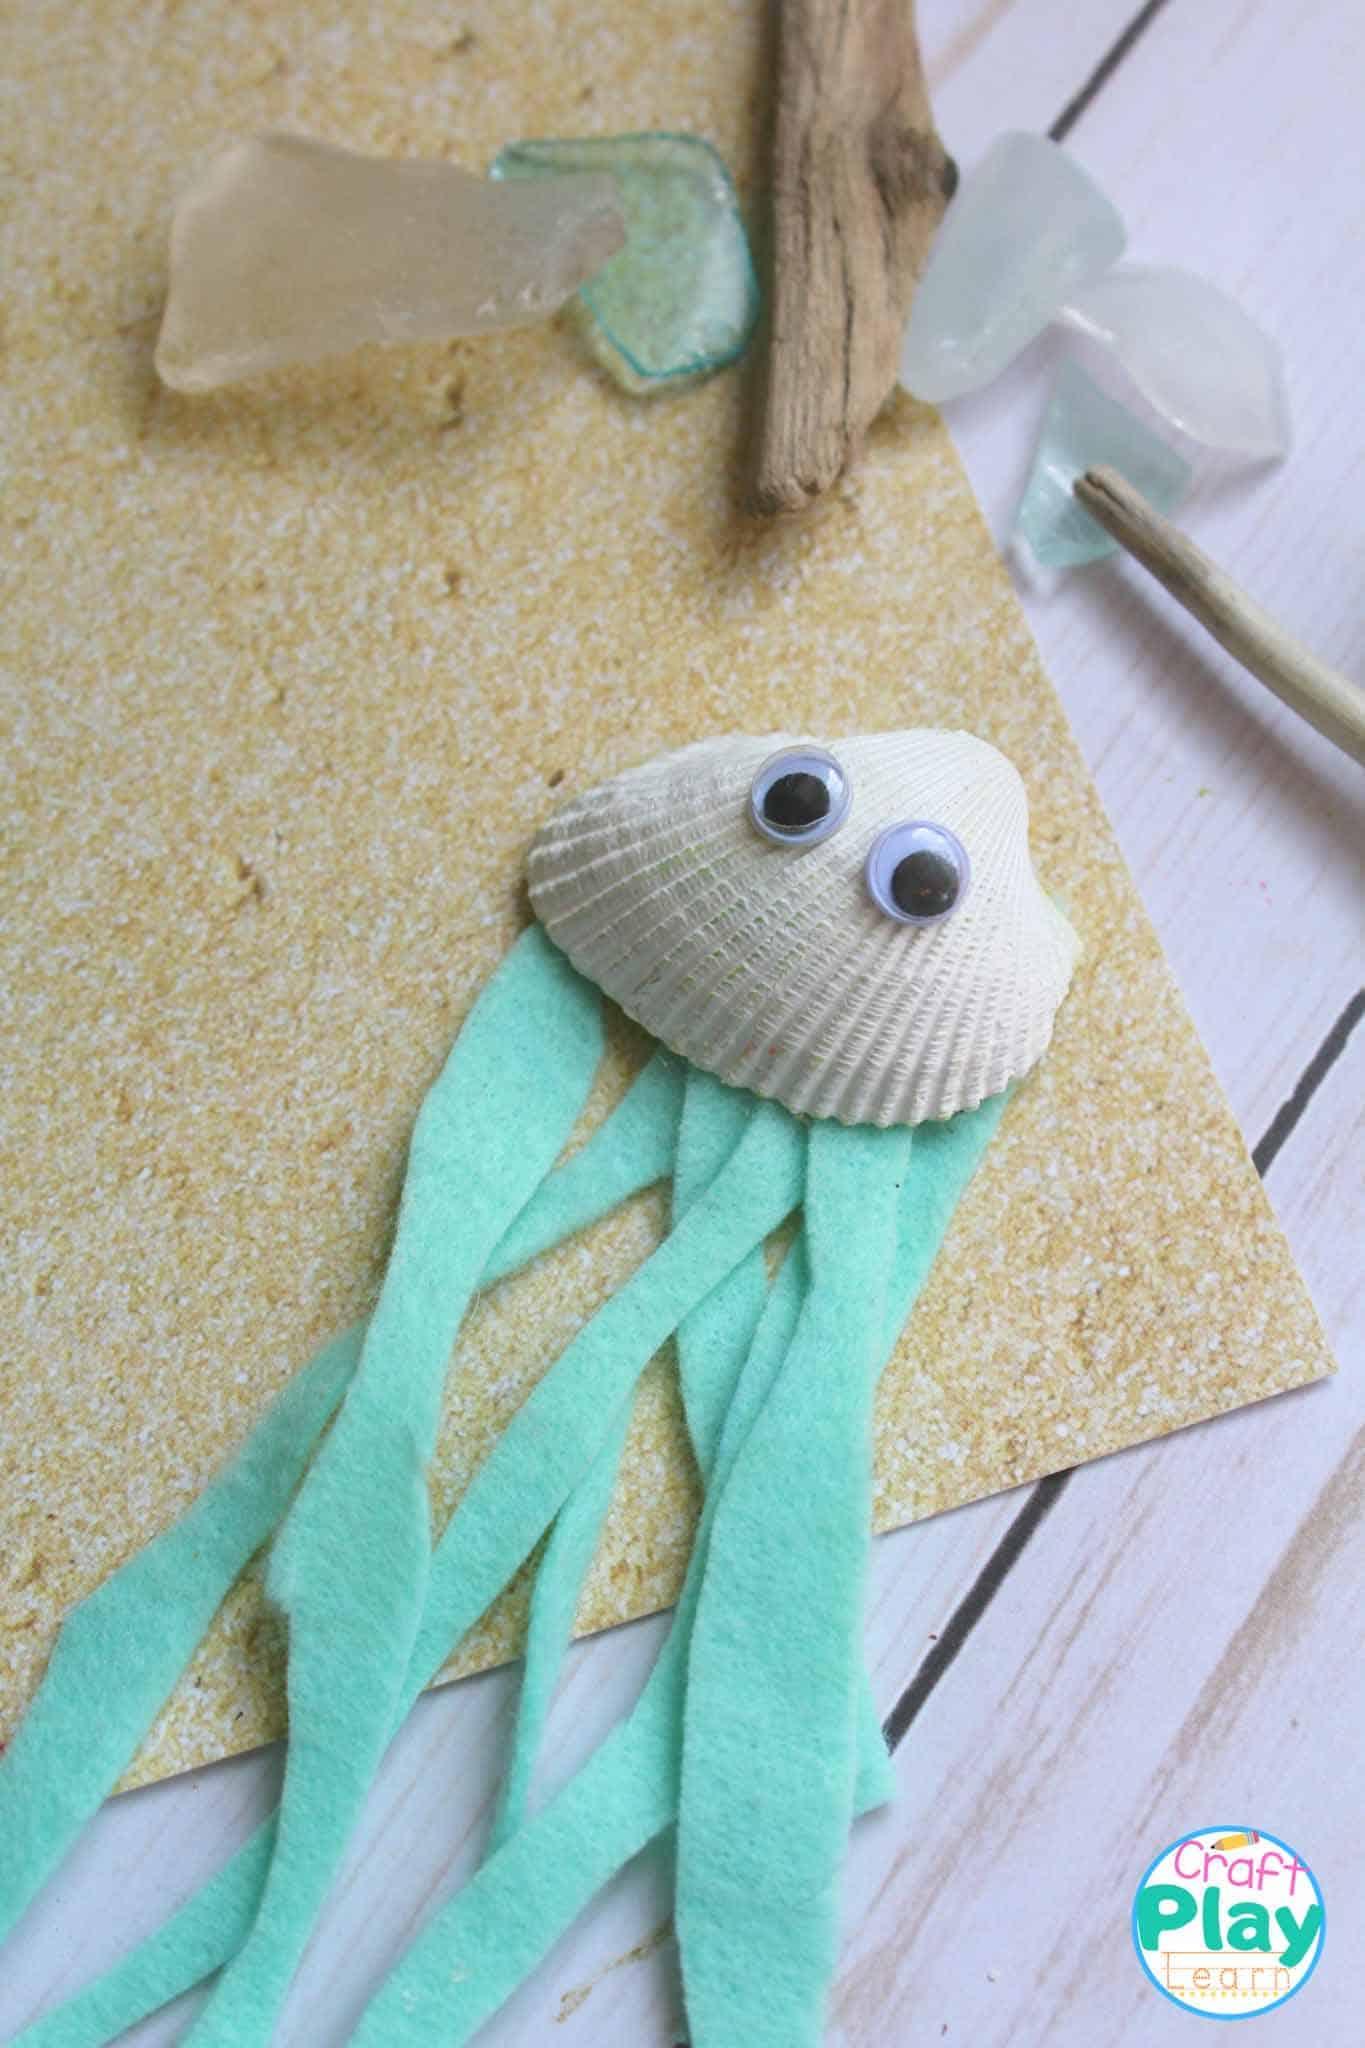 jellyfish craft for preschool kids to make